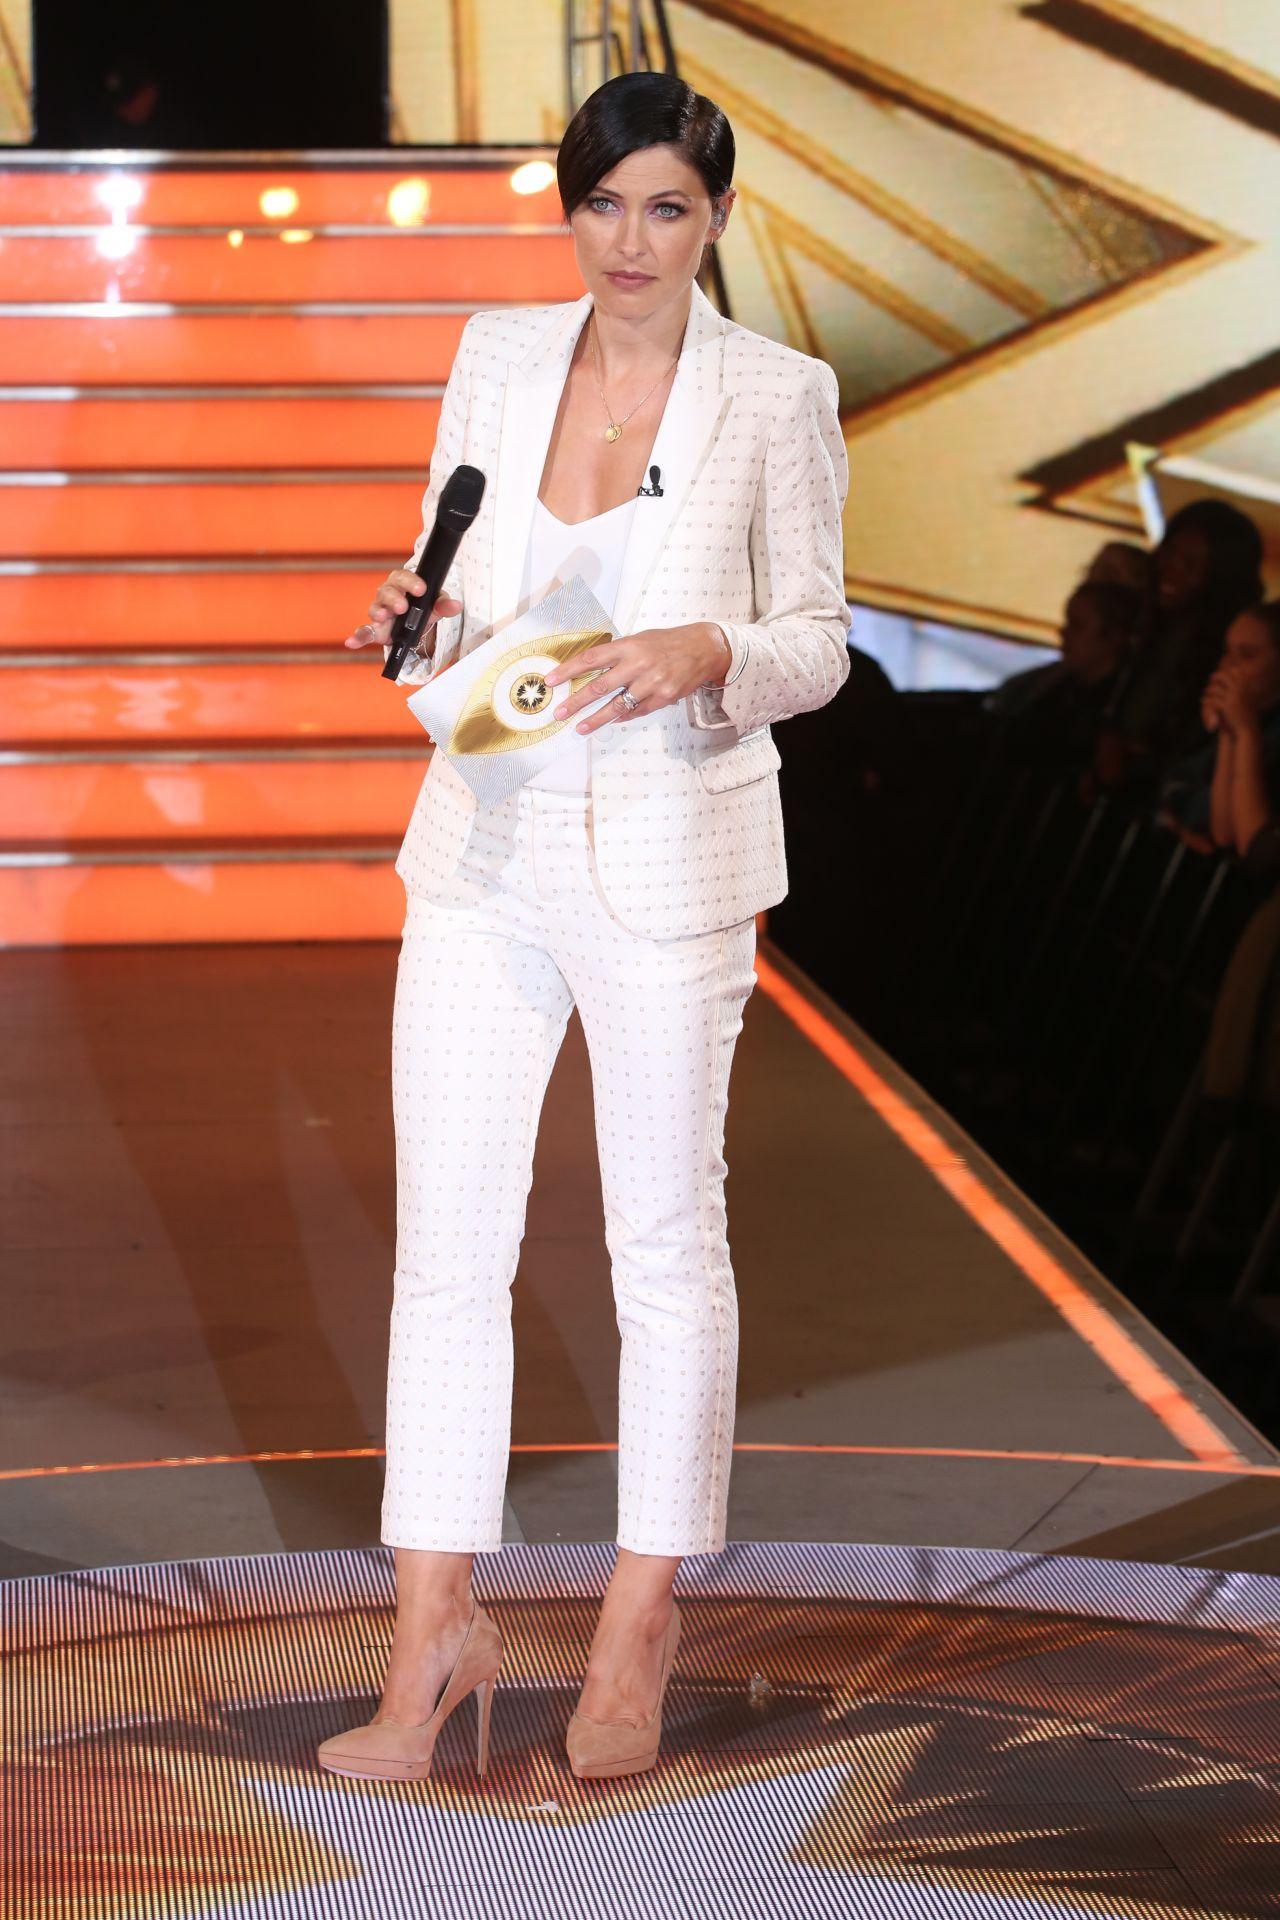 Celebrity Big Brother: What make-up does Emma Willis wear?